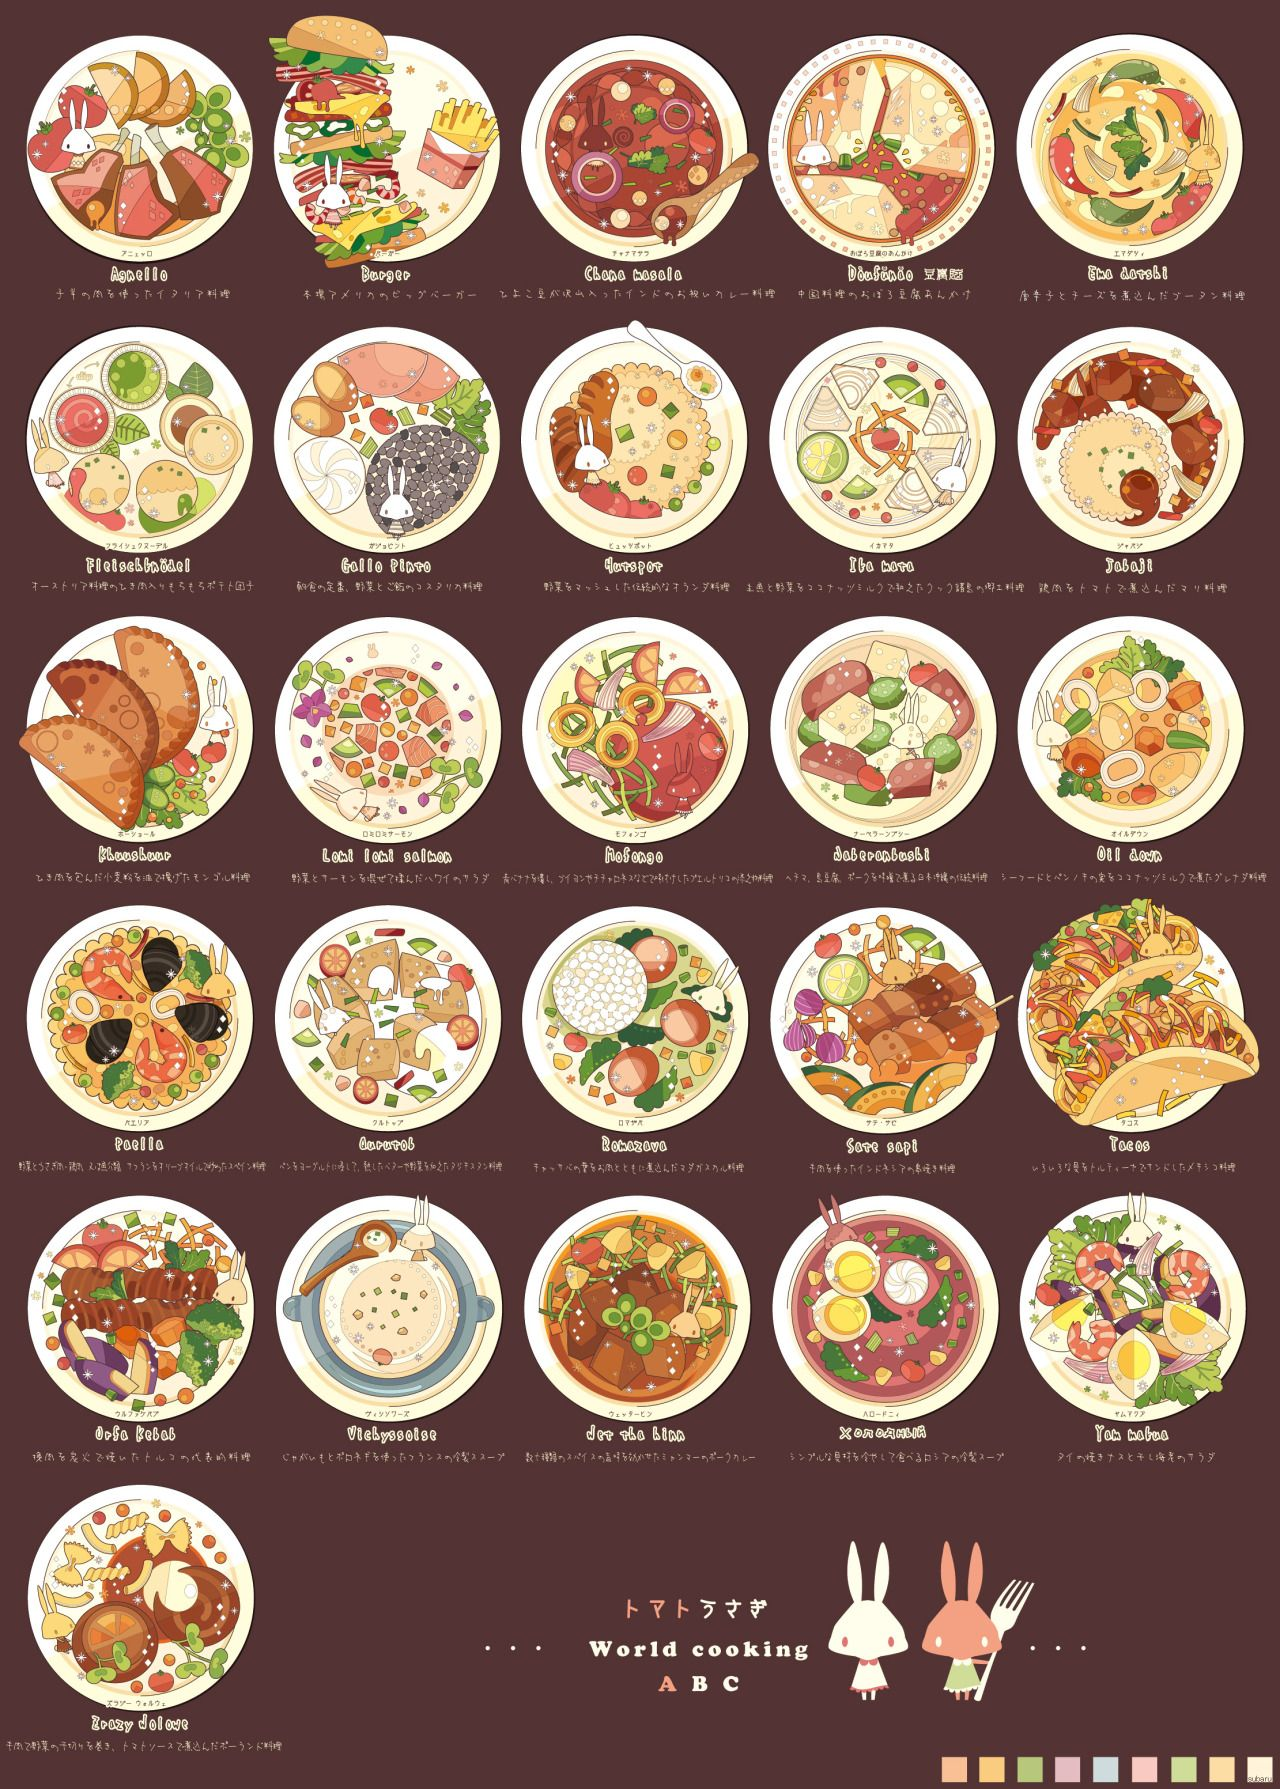 Drawn Food!: Photo Drawn Food! : Photo